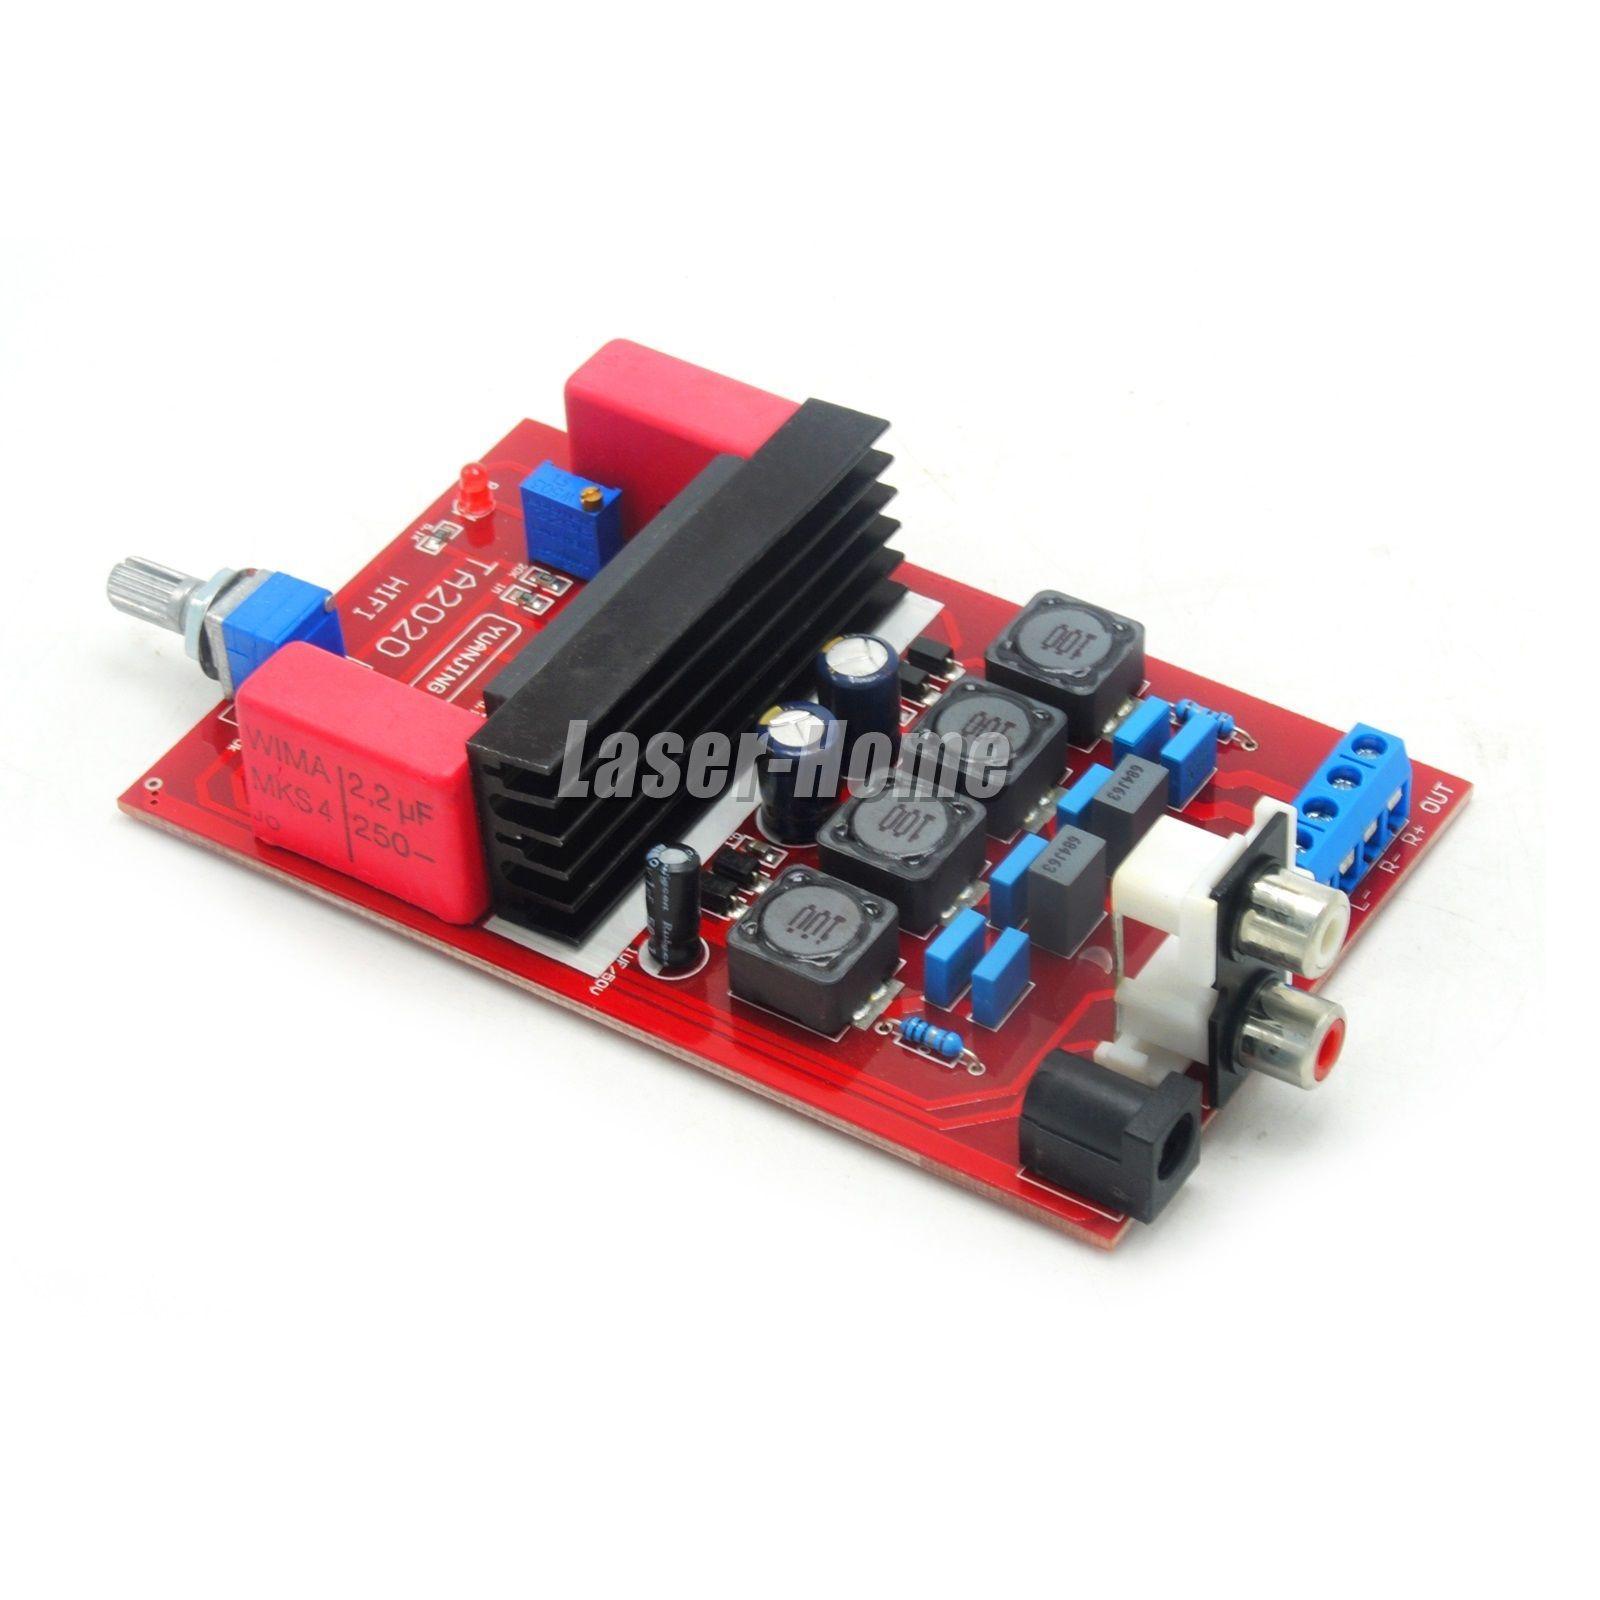 Tpa3116d2 100w Digital Amplifier Board Subwoofer Ne5532 Am 2x50w Stereo Class D Audio Power Circuit Ebay Ta2020 20w 2 Dc12v 3a Amp Parts